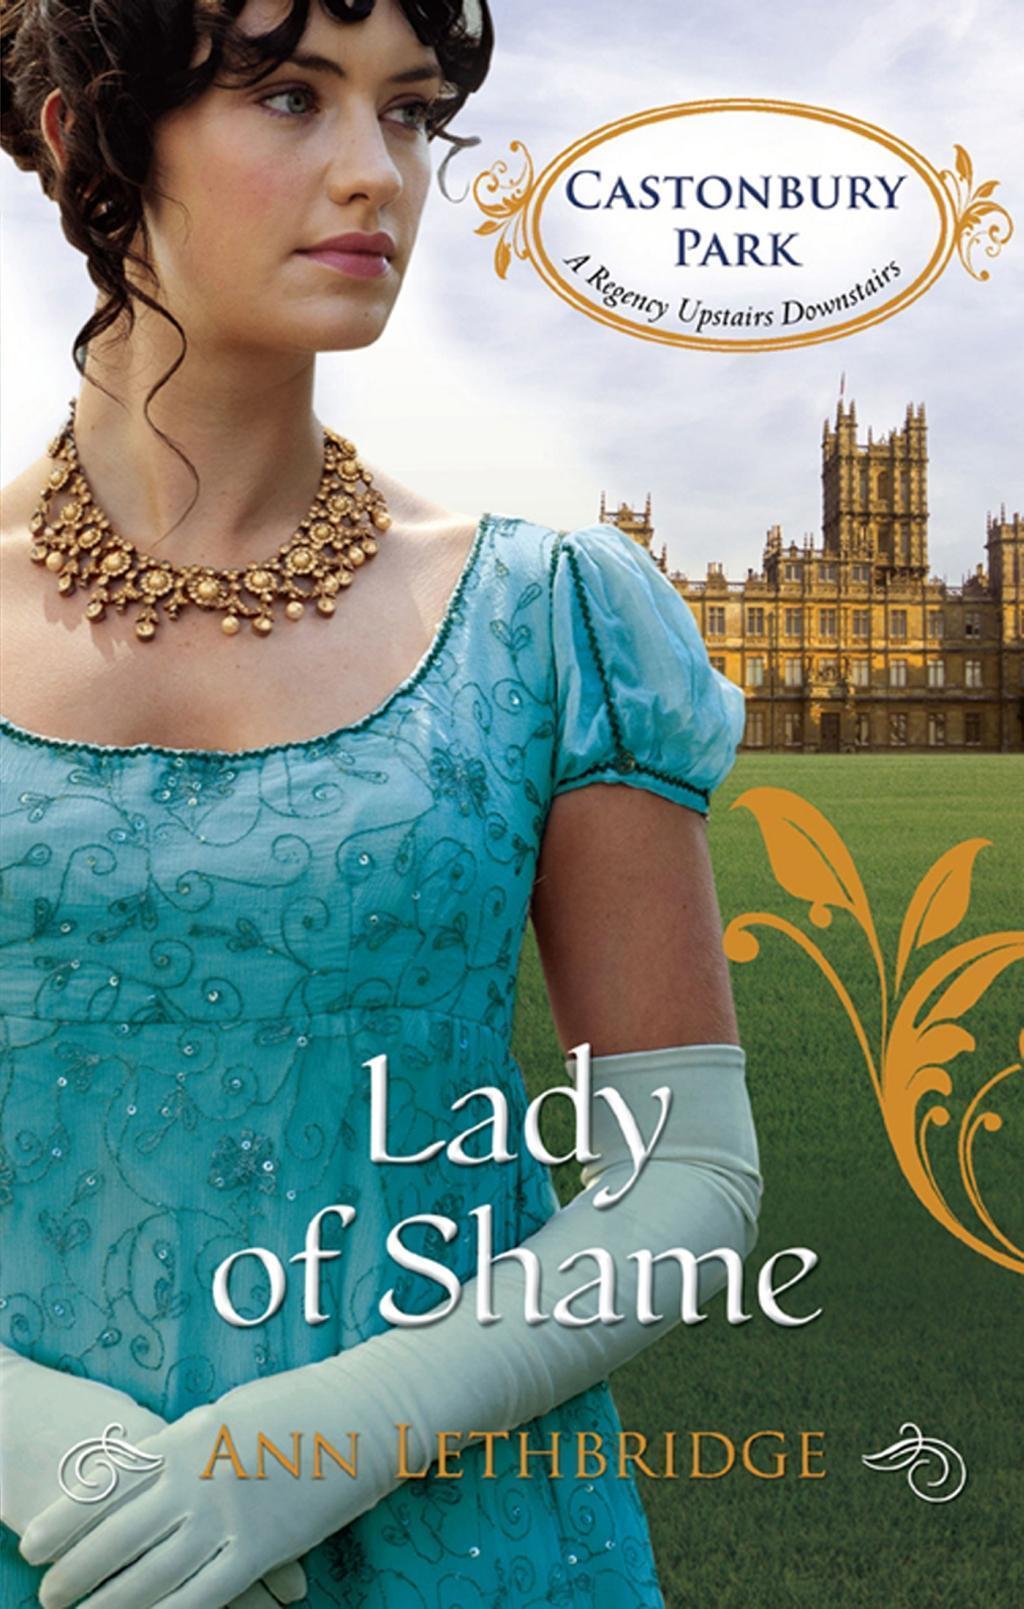 Lady of Shame (Mills & Boon M&B) (Castonbury Park, Book 4)